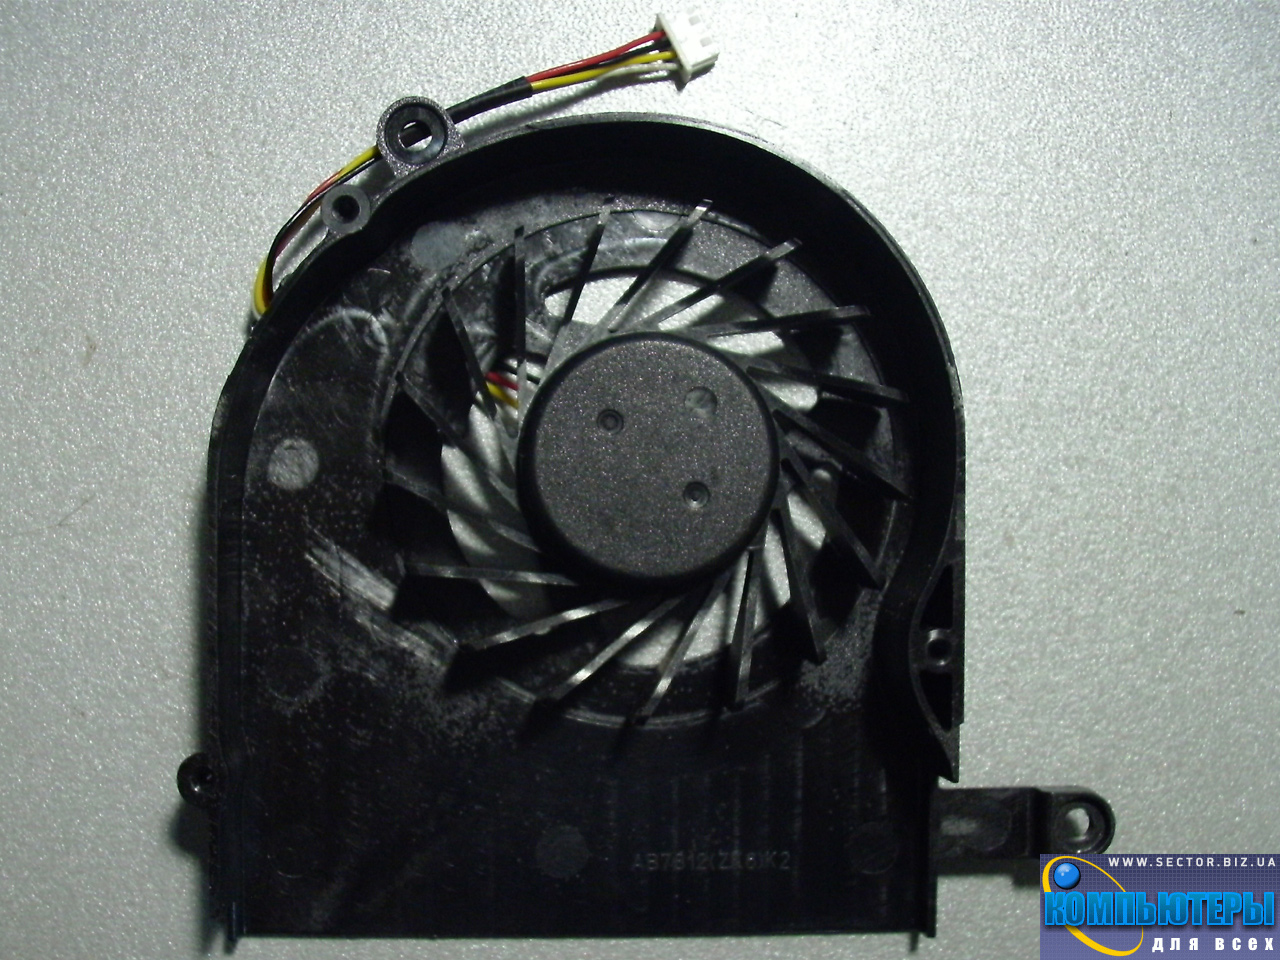 Кулер к ноутбуку Acer Aspire 5739 5739G p/n: AB7805HX-EBB (ZK6). Фото № 2.